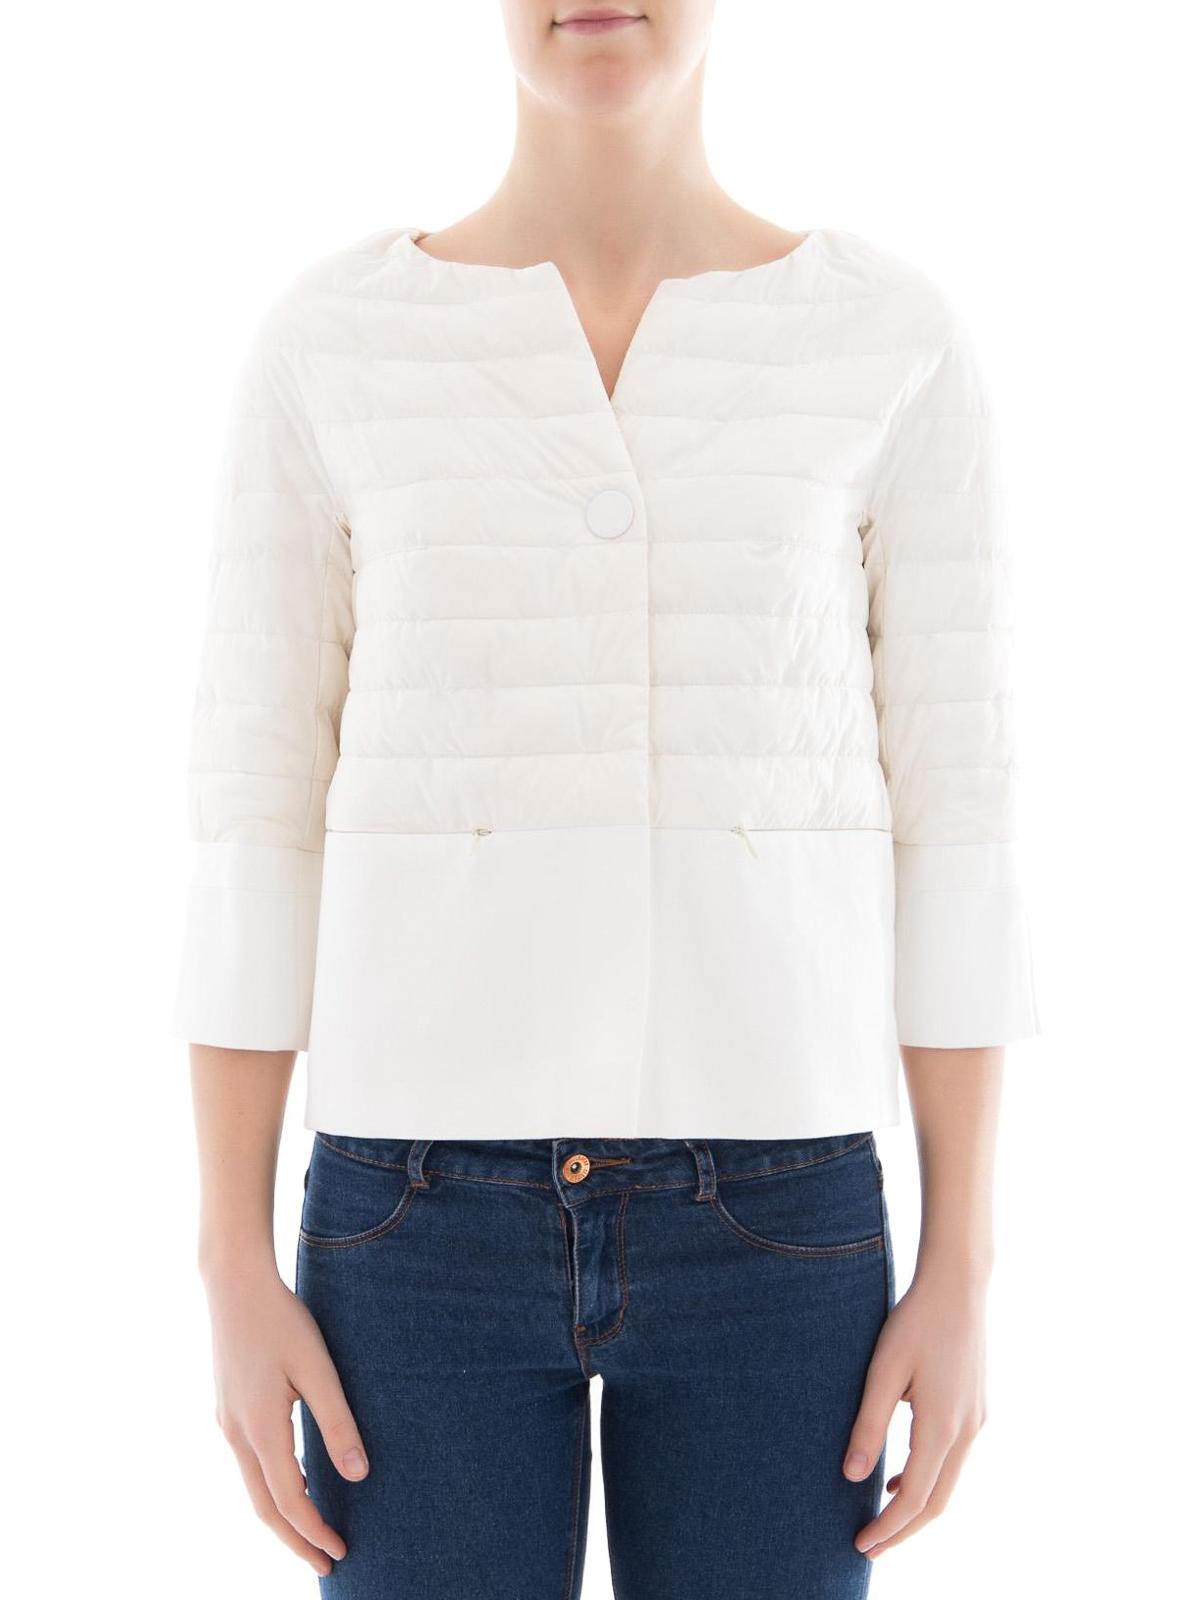 reputable site a780f 8adec Herno - Piumino bianco bon-ton impermeabile - giacche ...